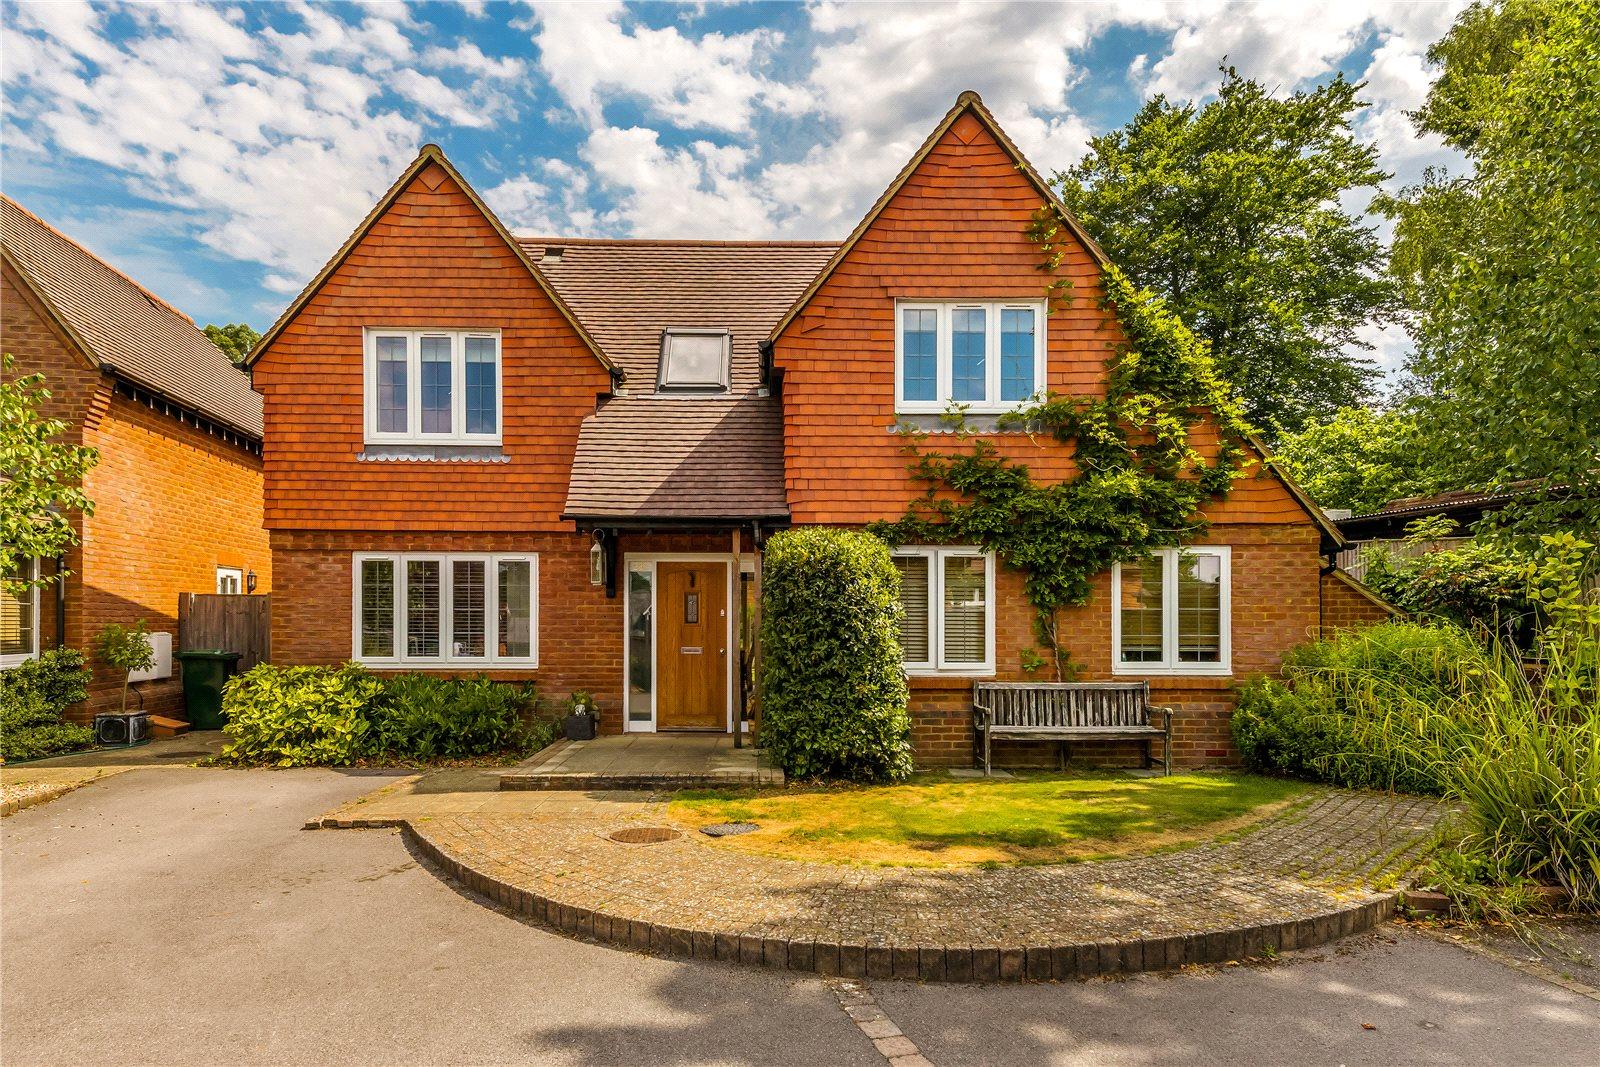 独户住宅 为 销售 在 Vann Road, Fernhurst, Haslemere, Surrey, GU27 Haslemere, 英格兰